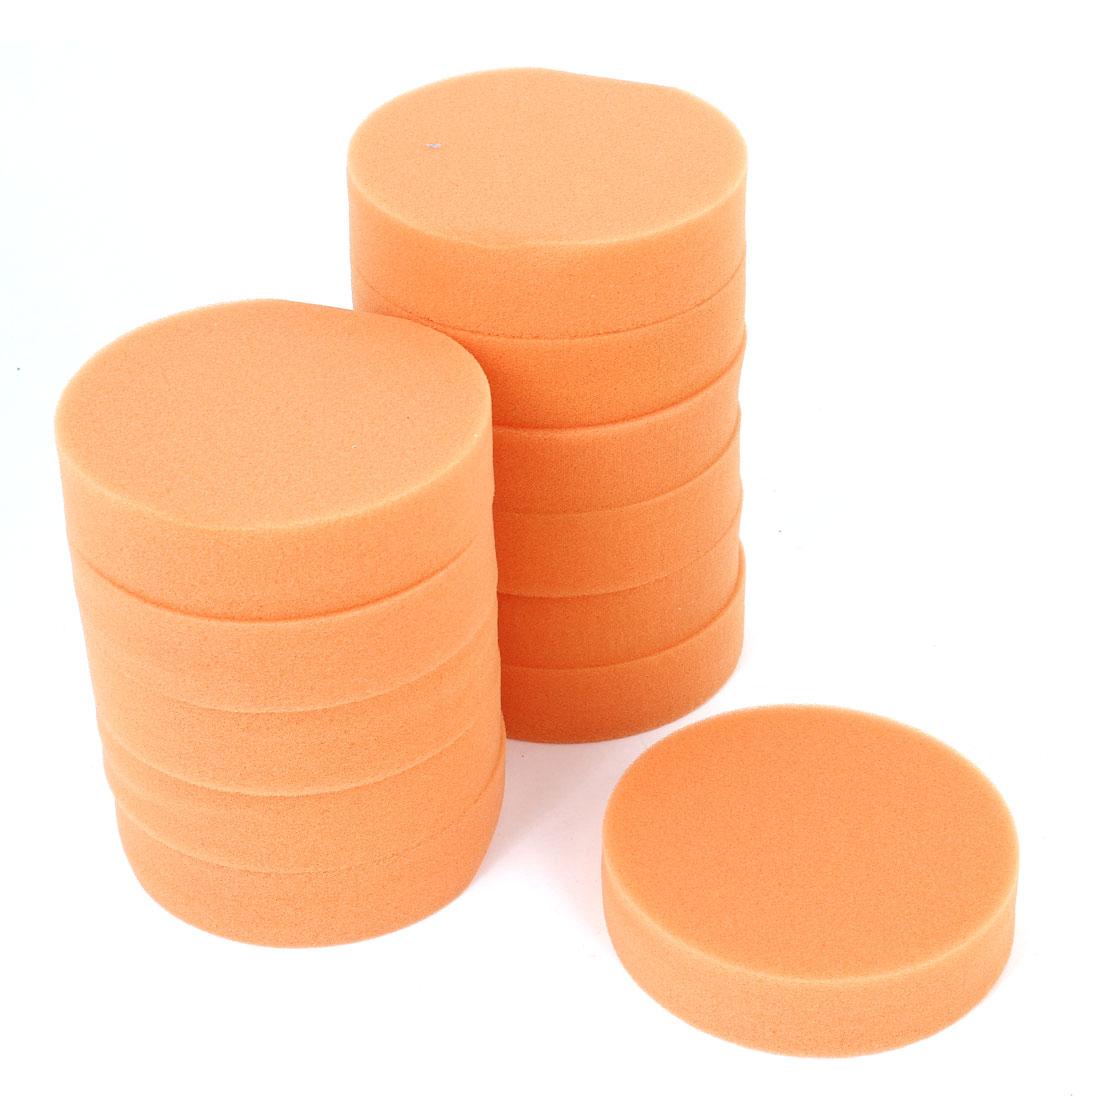 X Autohaux Car 12Pcs Cleaning Polishing Sponge Detailing Applicator Pads Orange